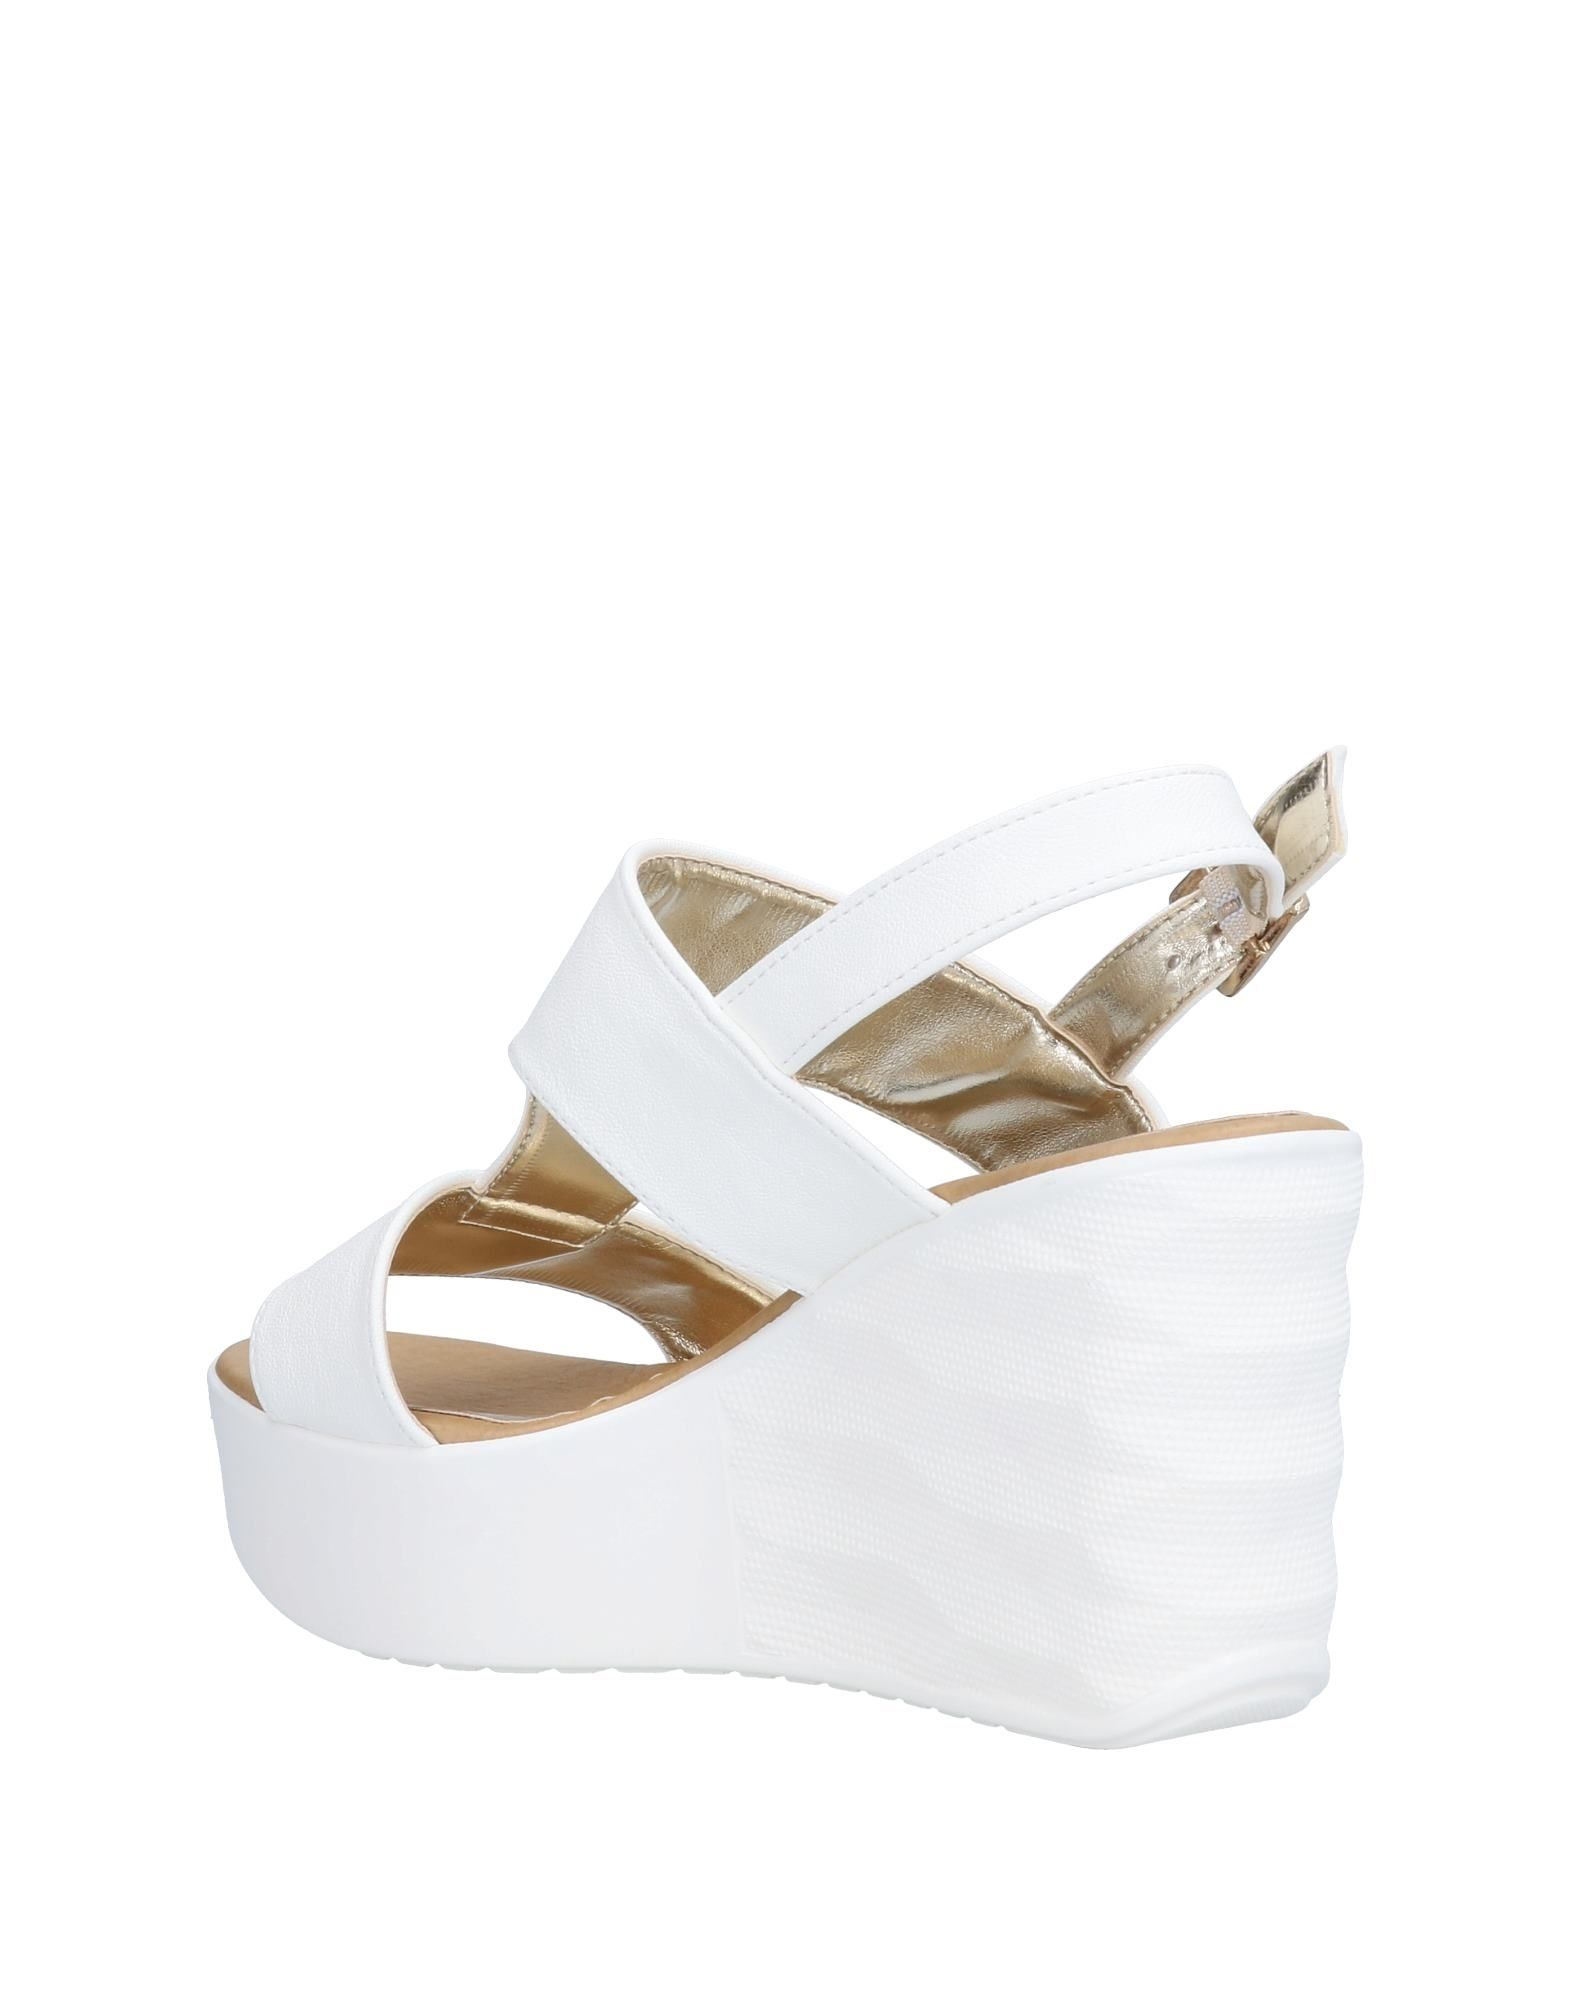 Angela George Sandalen Damen Damen Sandalen  11499538JA Gute Qualität beliebte Schuhe d7bad2